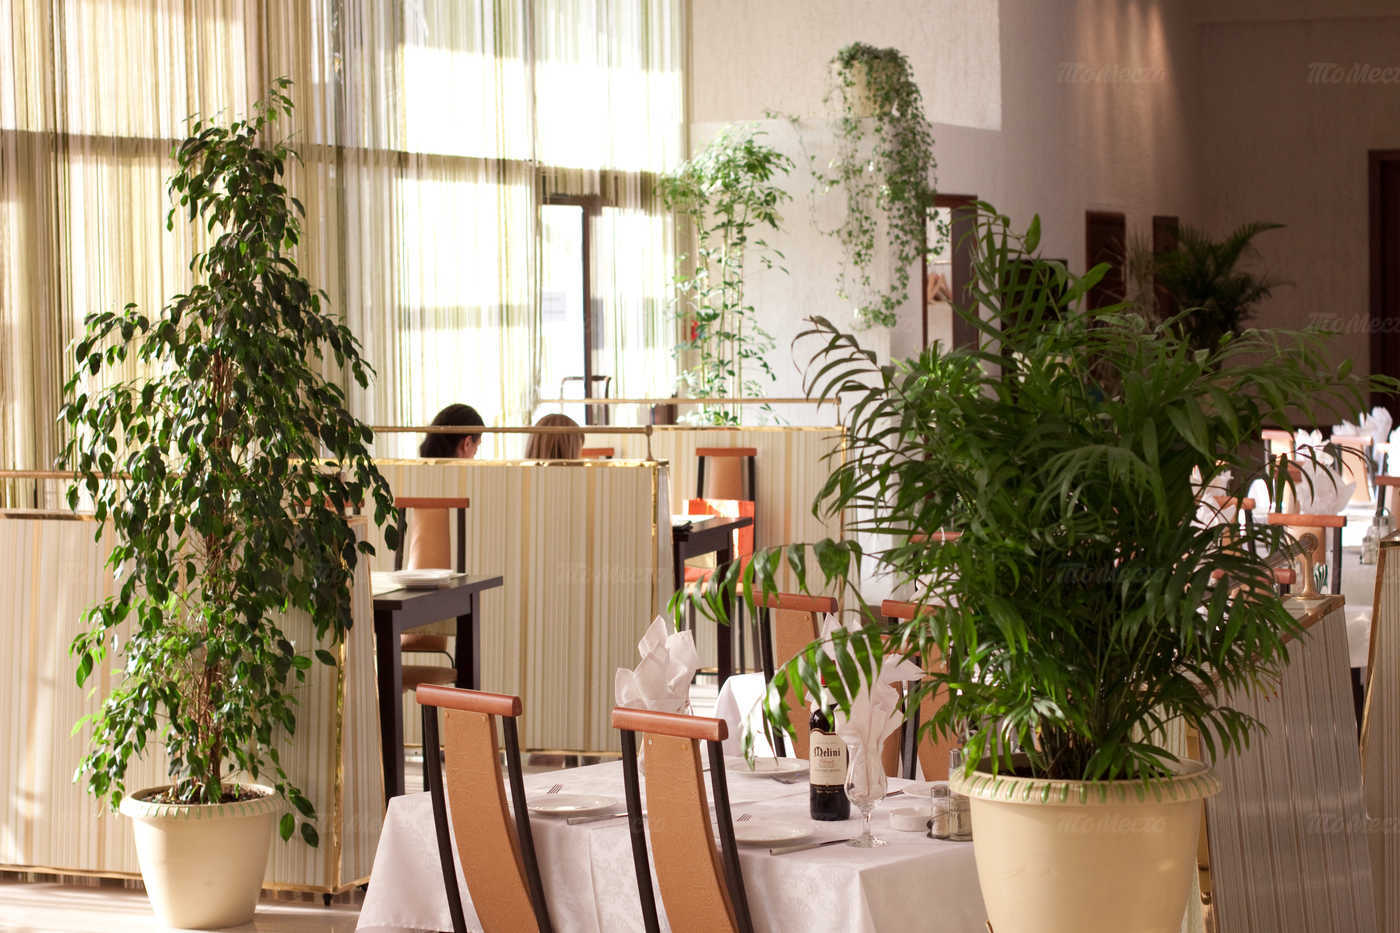 Меню ресторана Прага (Praga) на Торфяной дороге